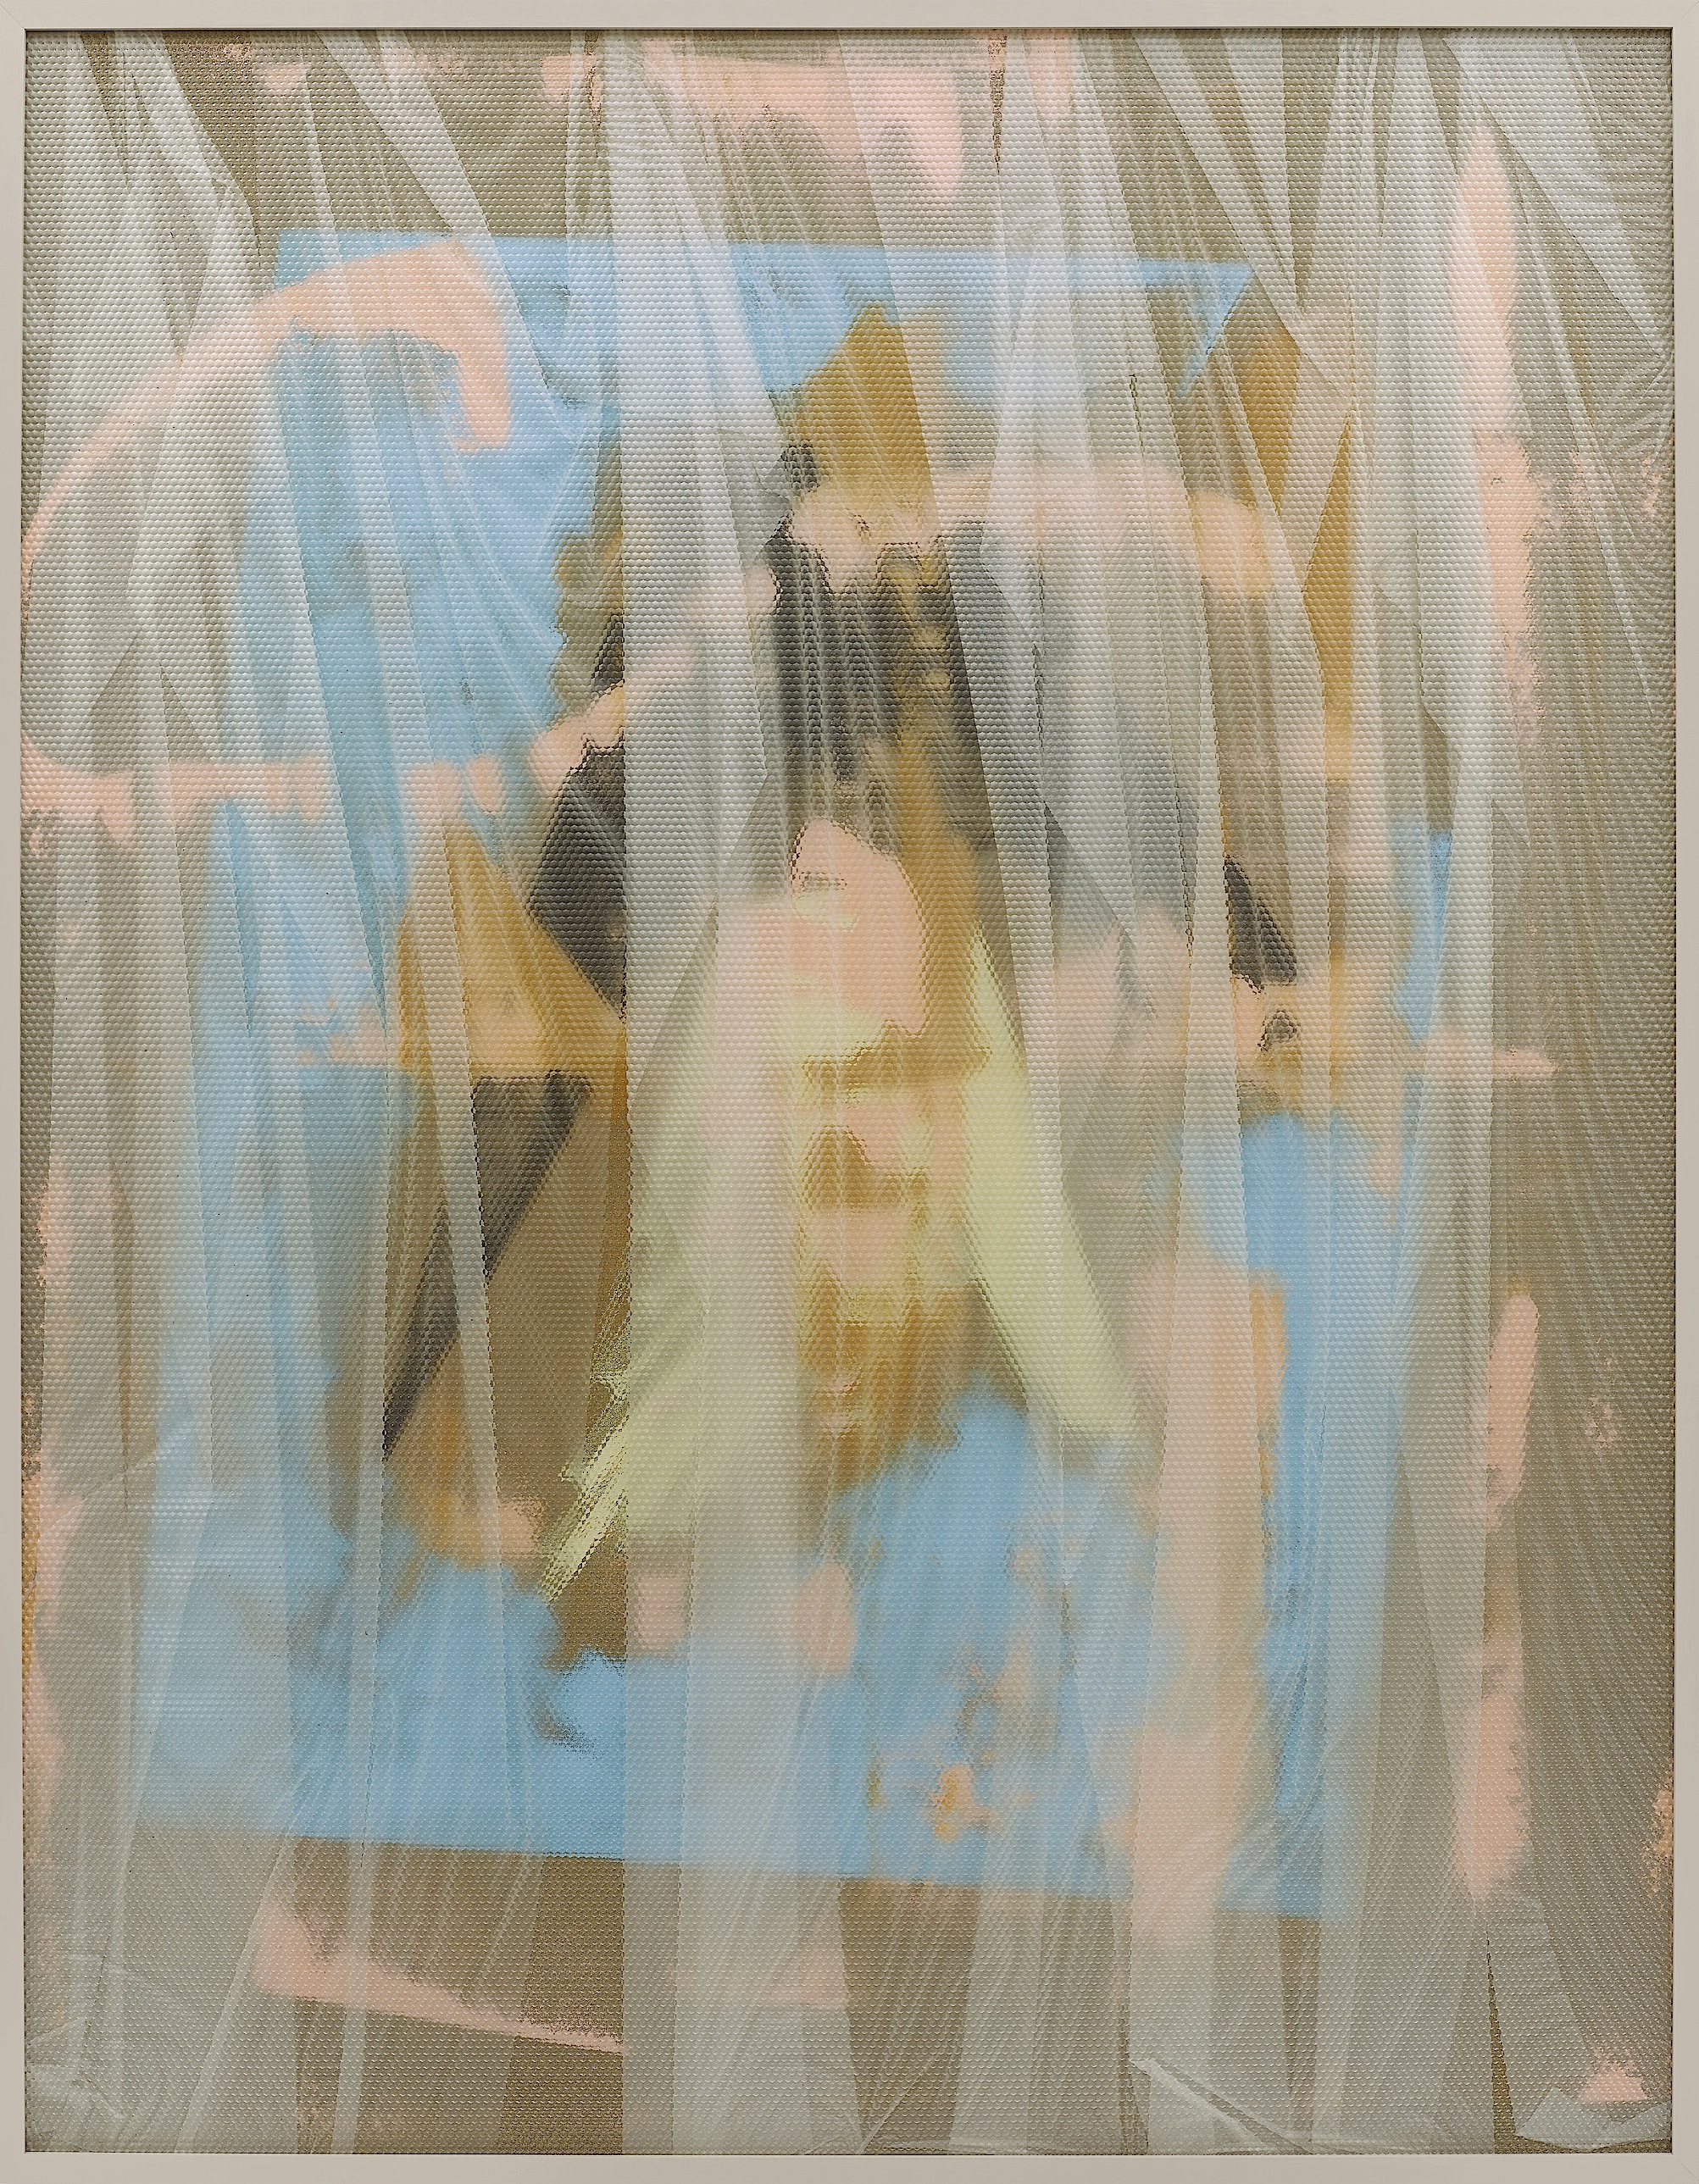 Eidolon / Part VII,  2013 Oil, acrylic and latex on canvas beneath textured Plexiglas 180 x 140 cm (71 x 55 in)